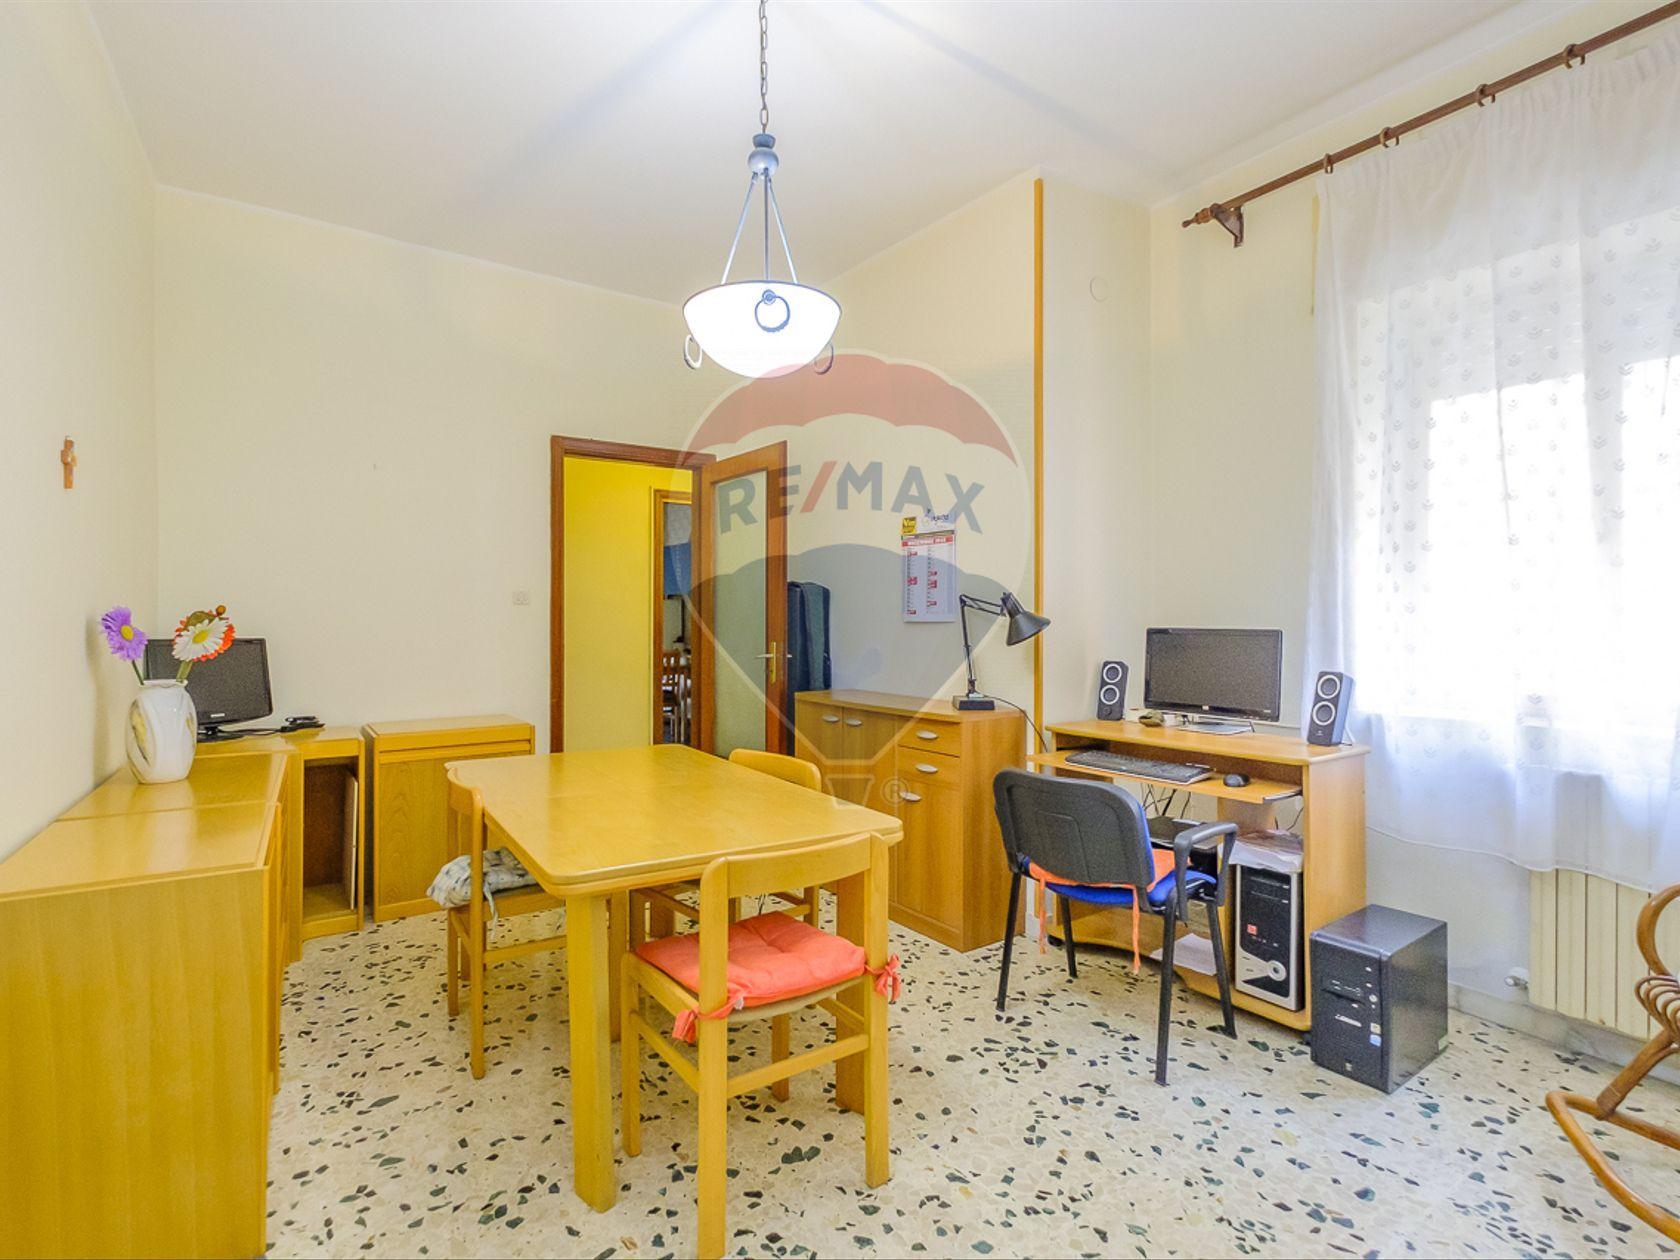 Appartamento Siracusa- Scala Greca S. Panagia Teracati Zecchino, Siracusa, SR Vendita - Foto 6